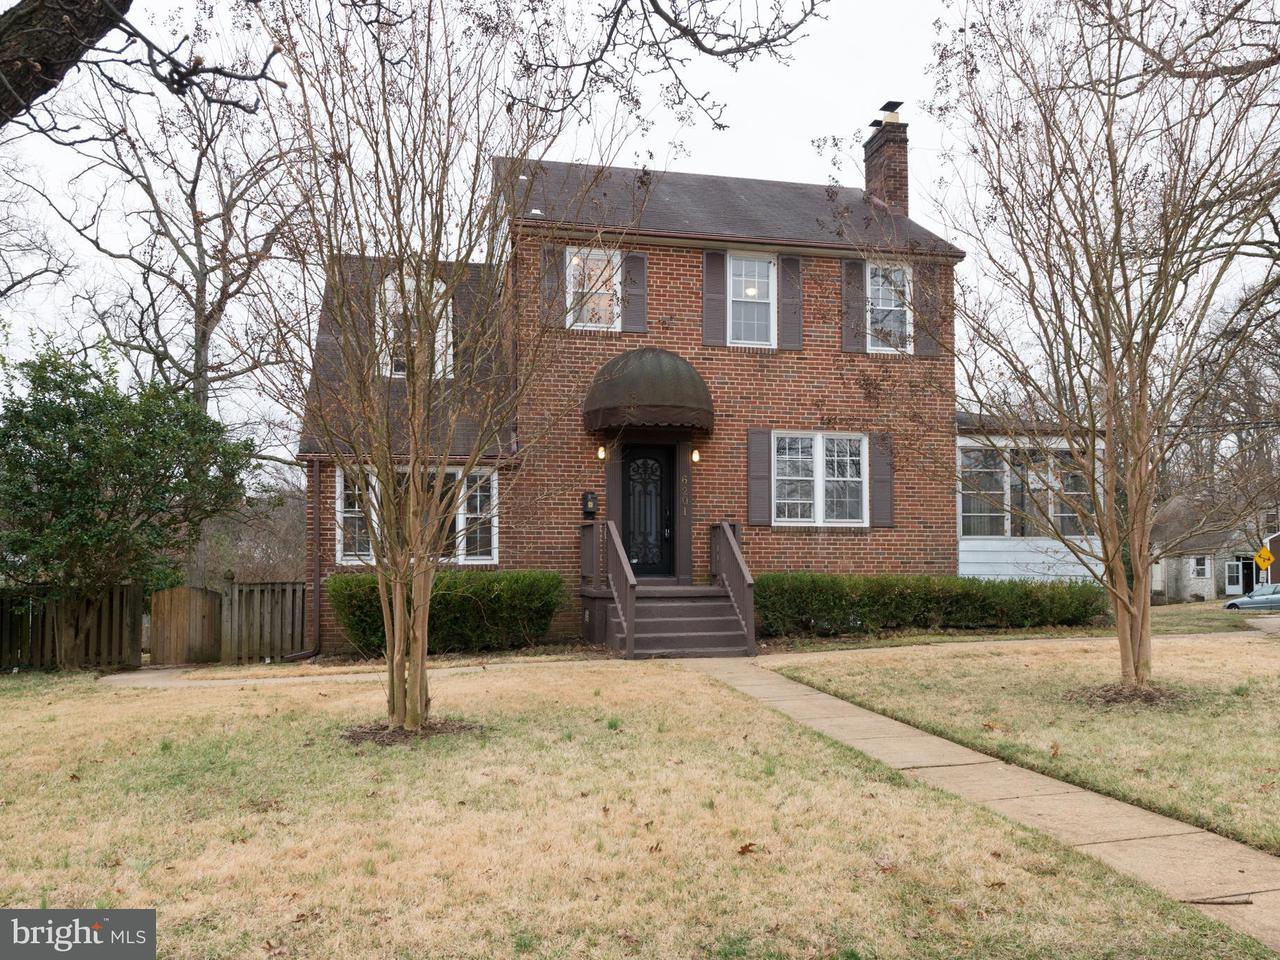 Single Family Home for Sale at 6201 Kilmer Street 6201 Kilmer Street Cheverly, Maryland 20785 United States